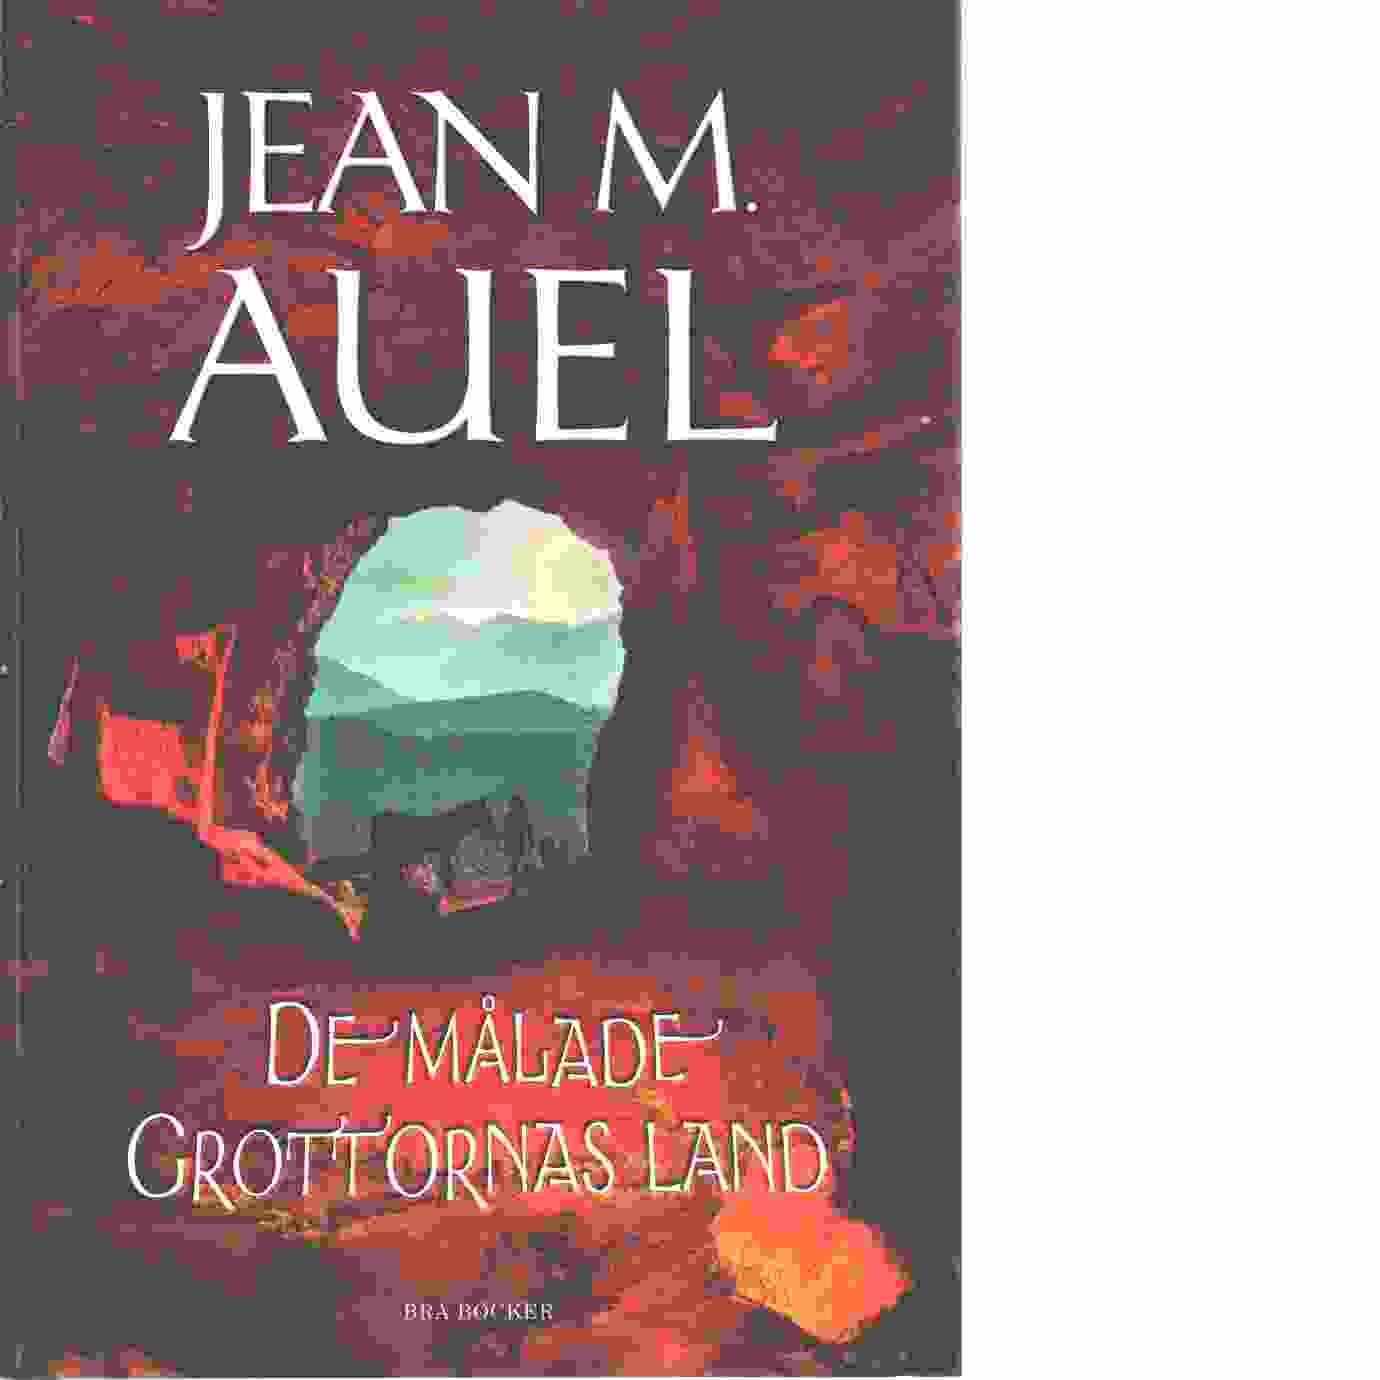 De målade grottornas land - Auel, Jean M